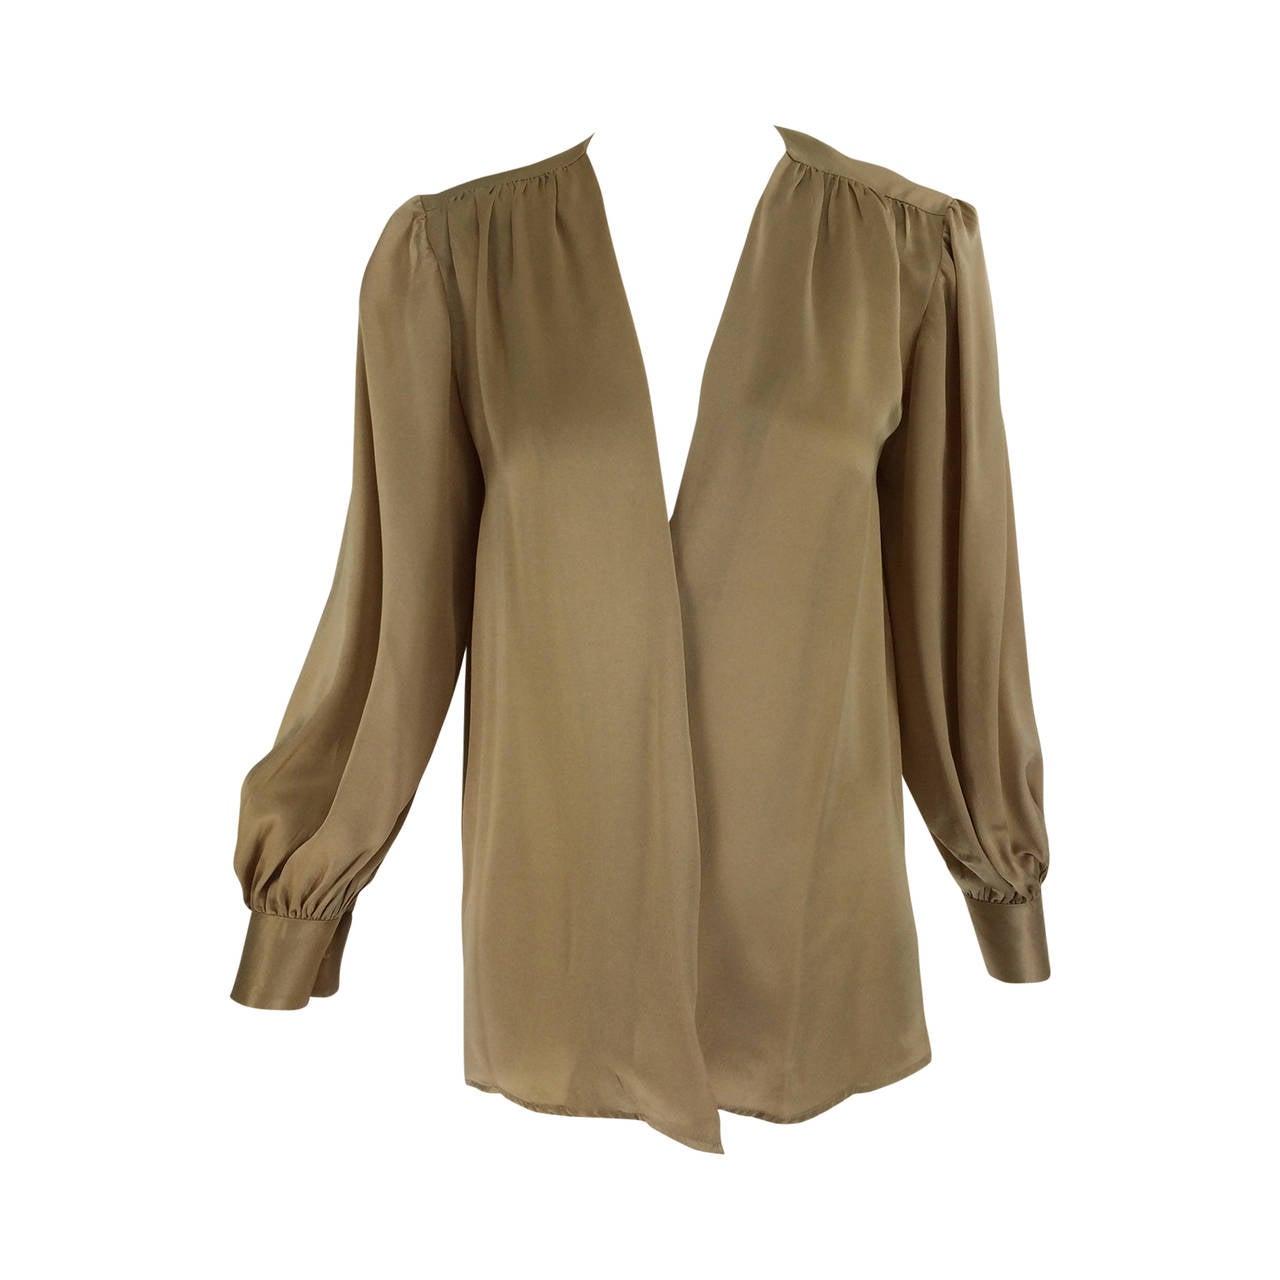 Yves St Laurent Rive Gauche gold silk charmeuse blouse 1990s